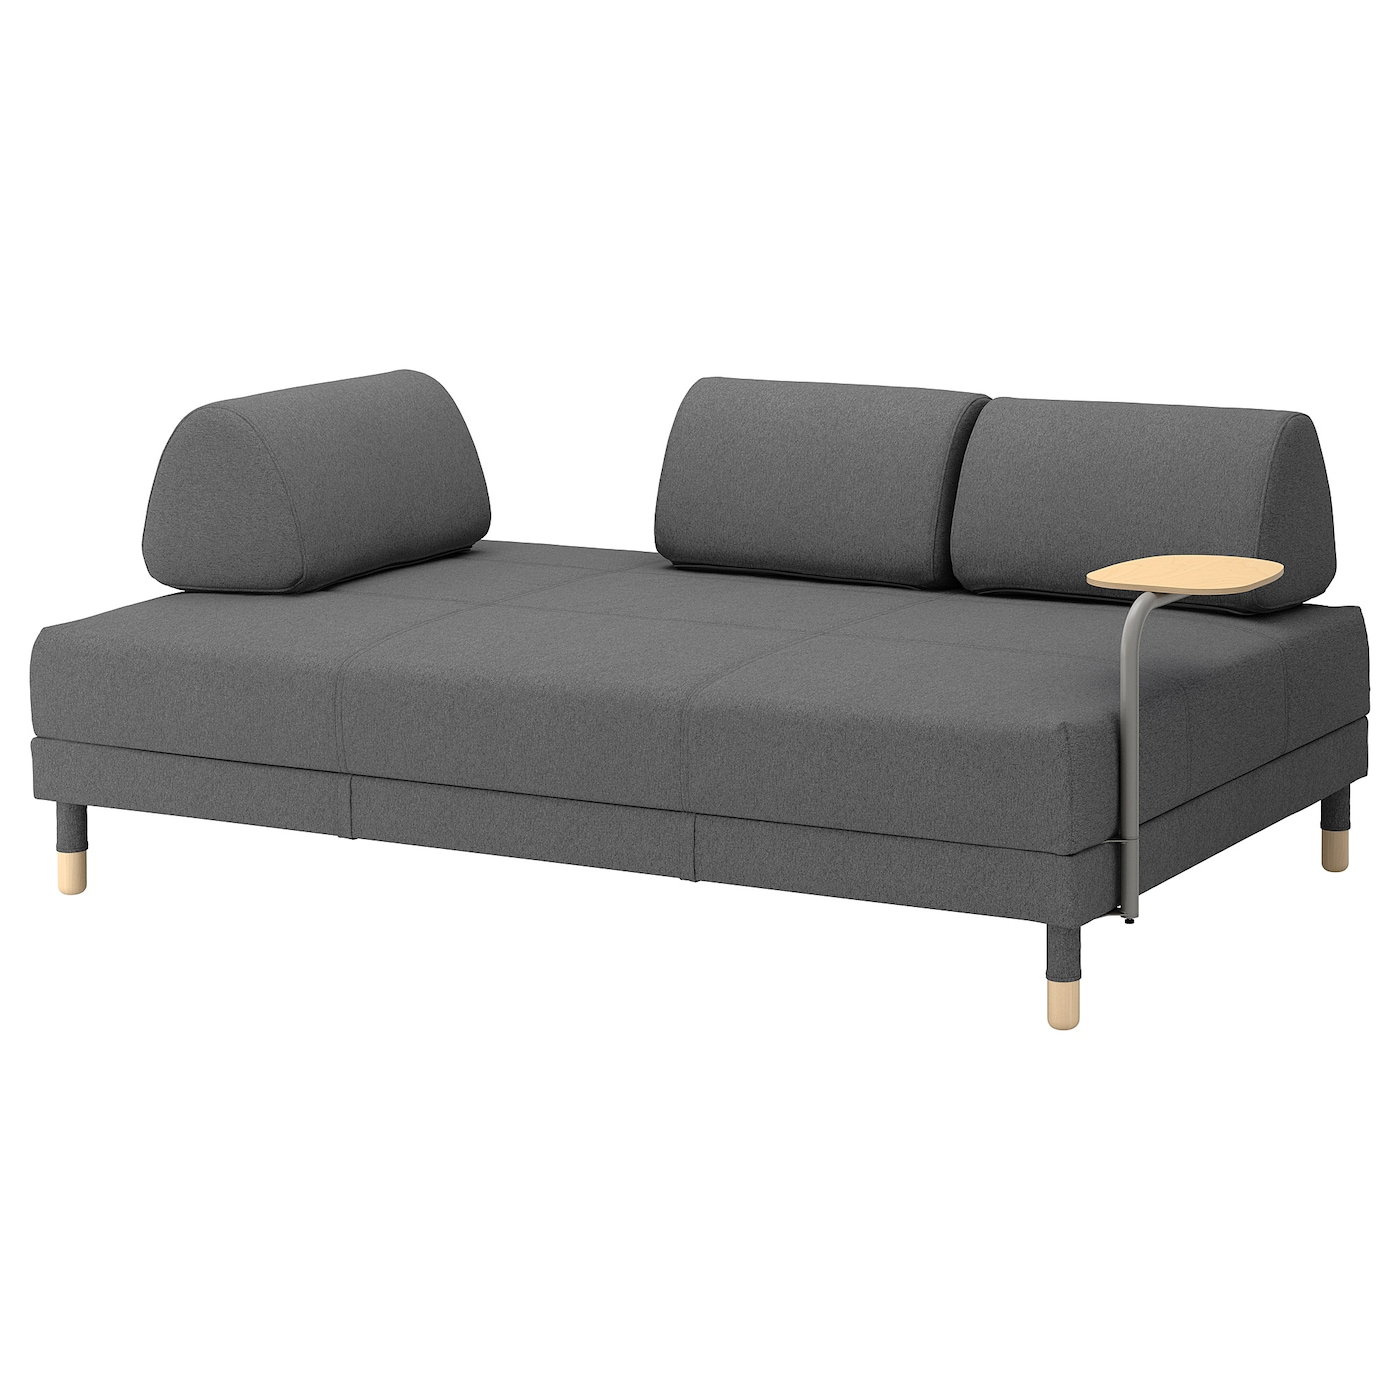 flottebo canap lit 3 places lysed gris fonc 120 cm ikea. Black Bedroom Furniture Sets. Home Design Ideas